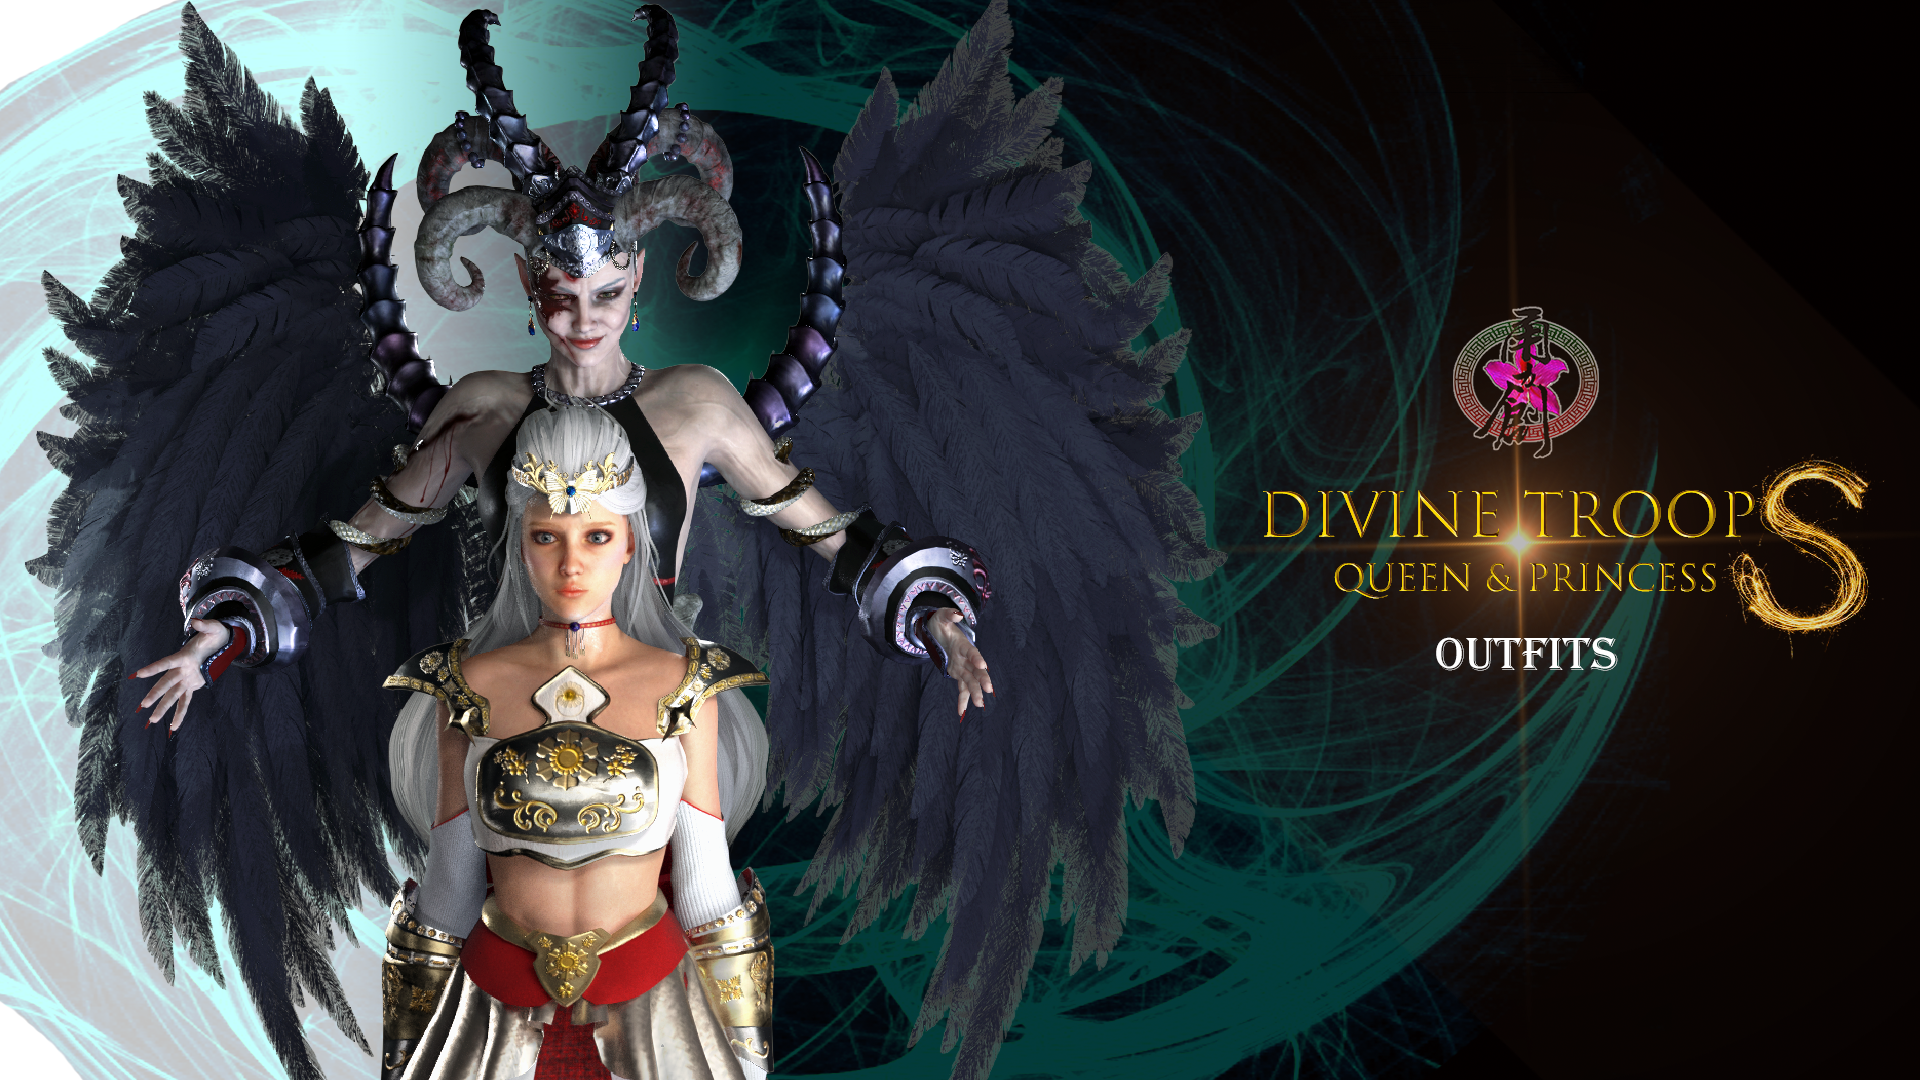 Divine Troop Super - Queen and Princess